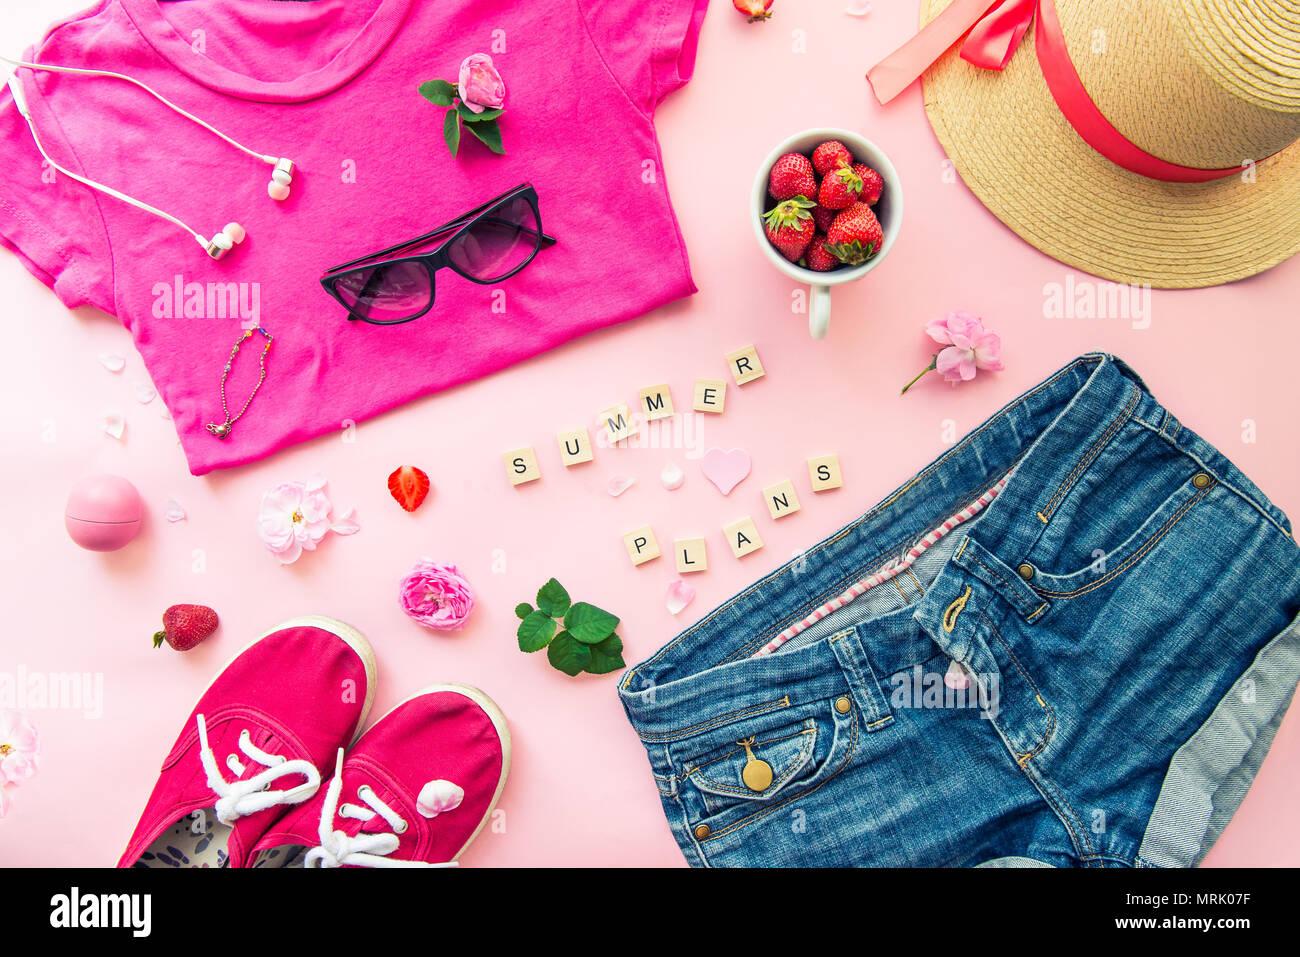 dc80089a342206 Frau Sommer Planung Konzept - Kleidung